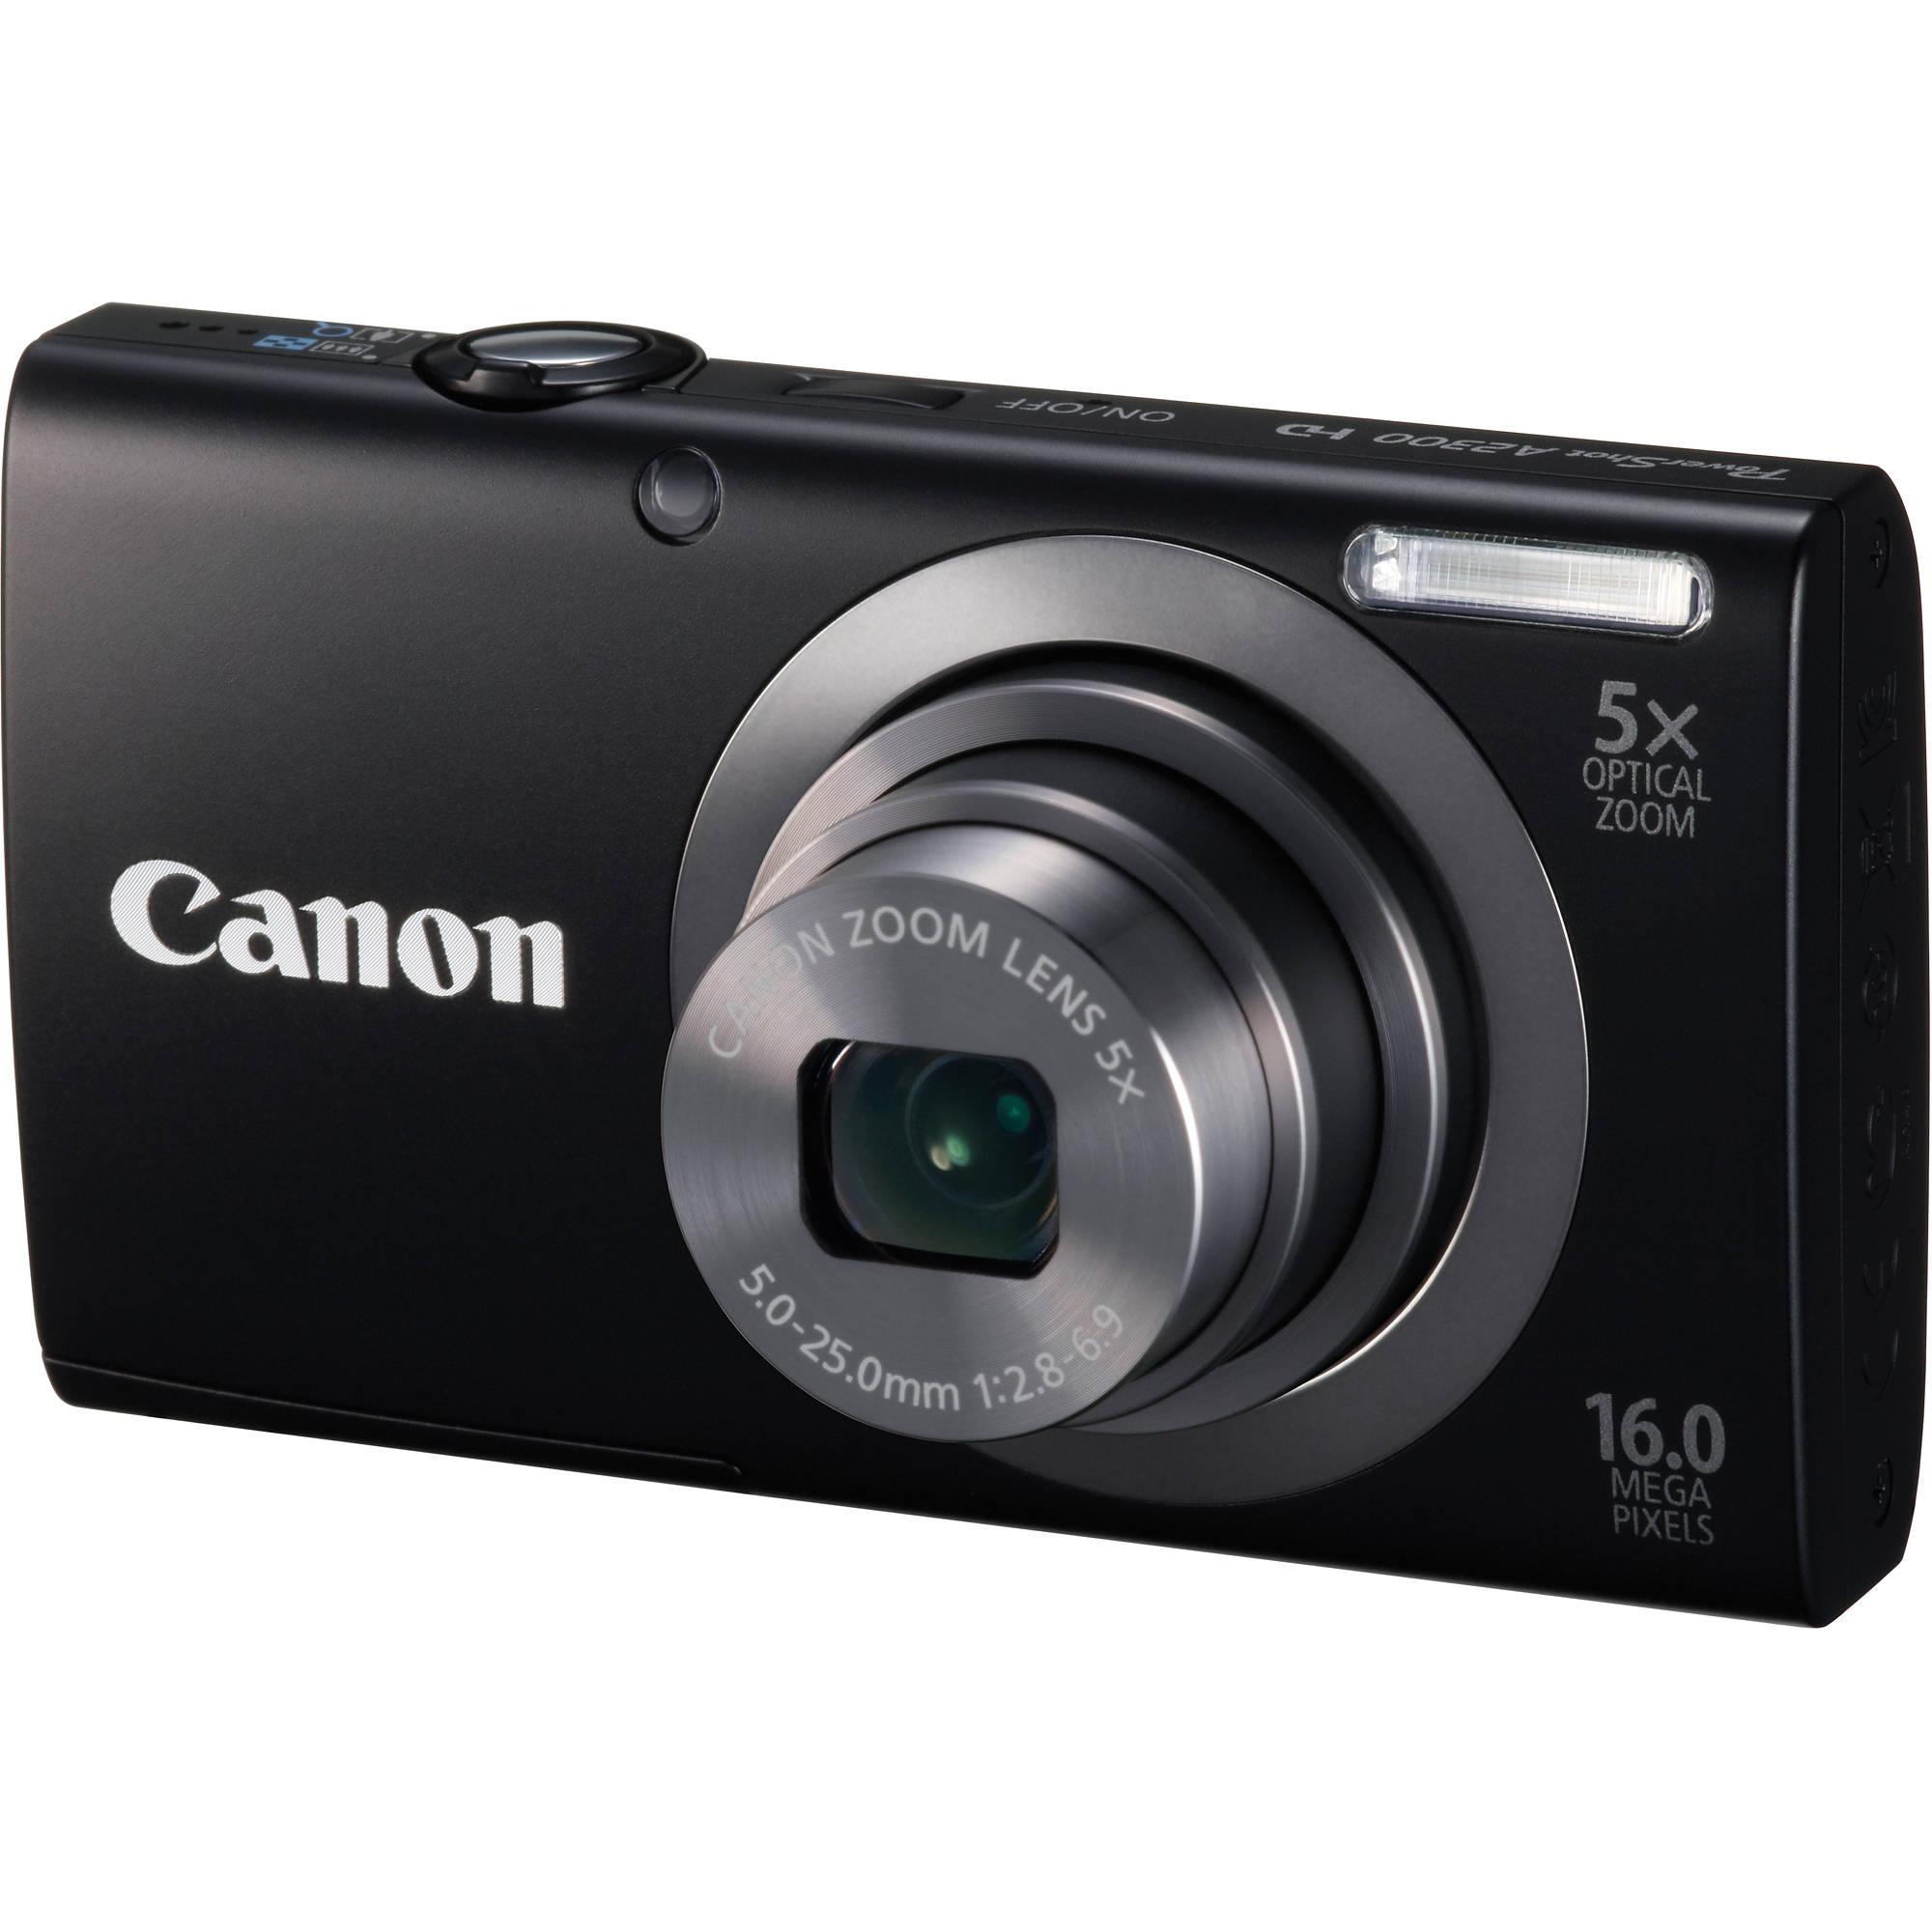 canon powershot a2200 hd manual